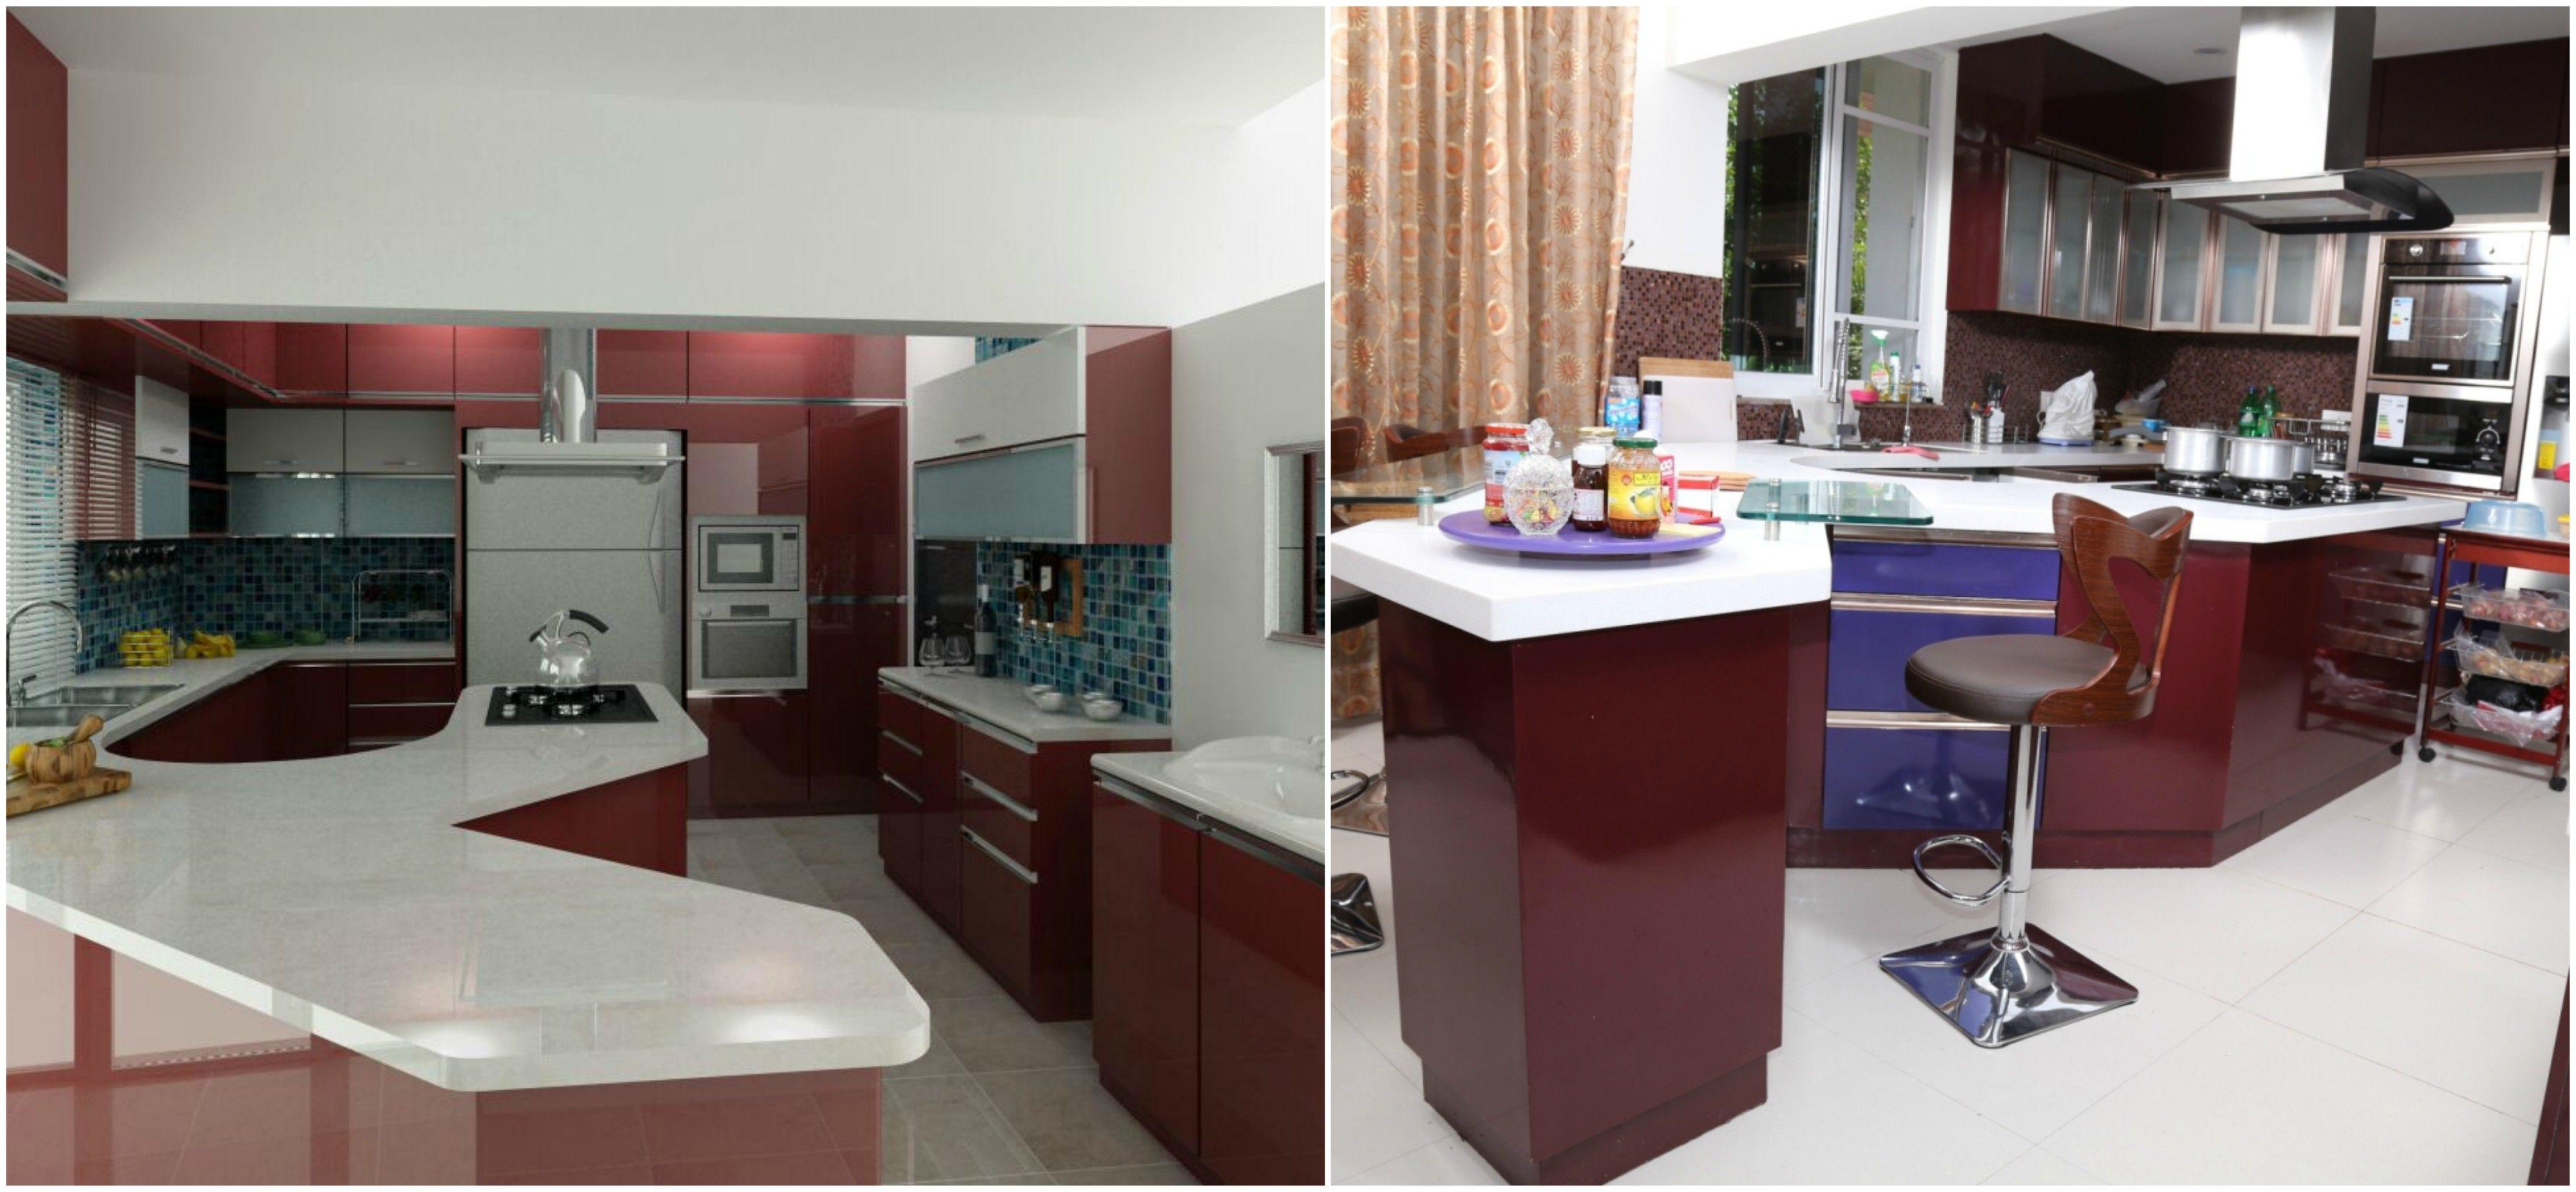 Kitcheninteriordesign elevation and execution pics of kitchen